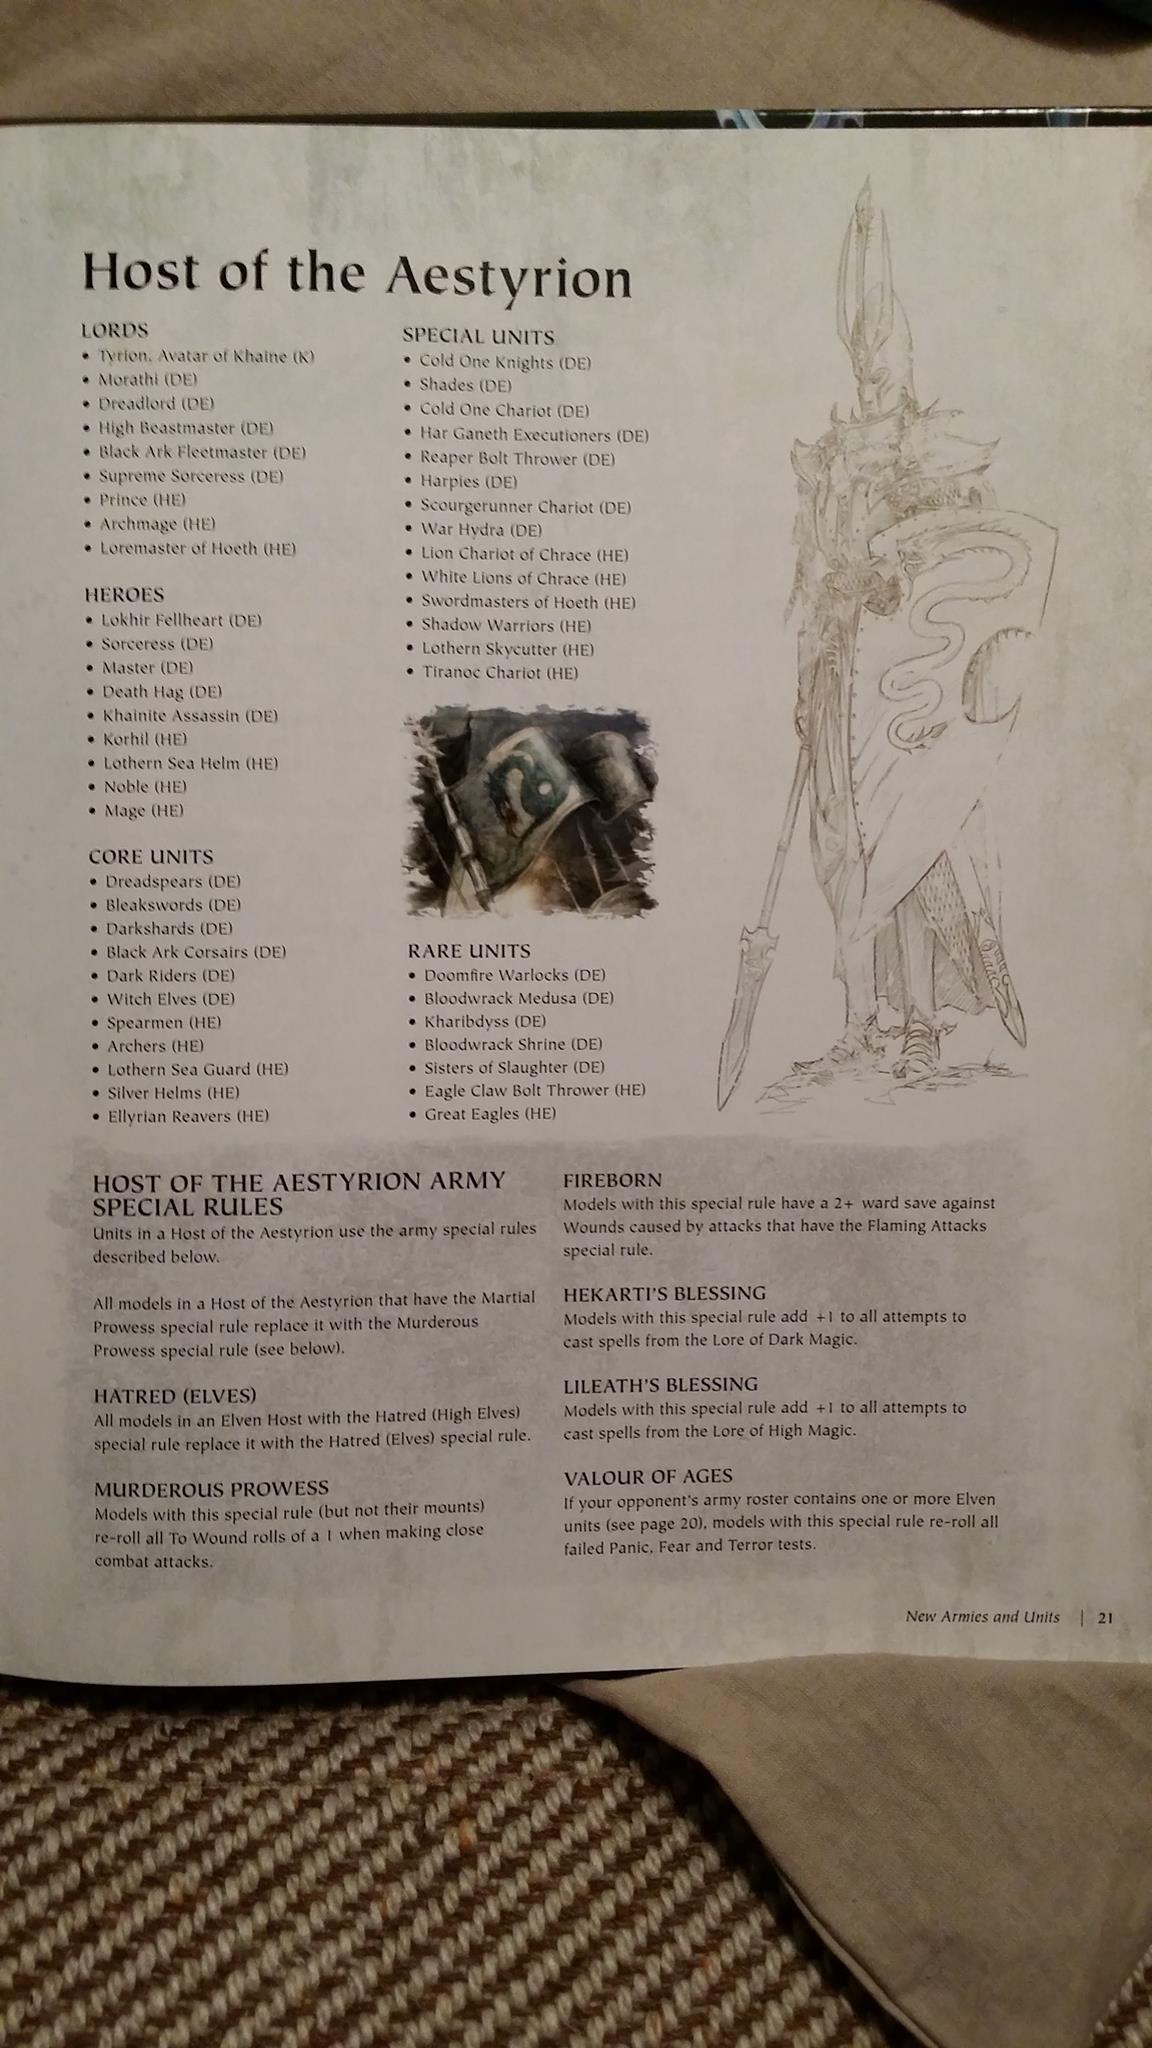 Warhammer Hueste de los Aestyrion